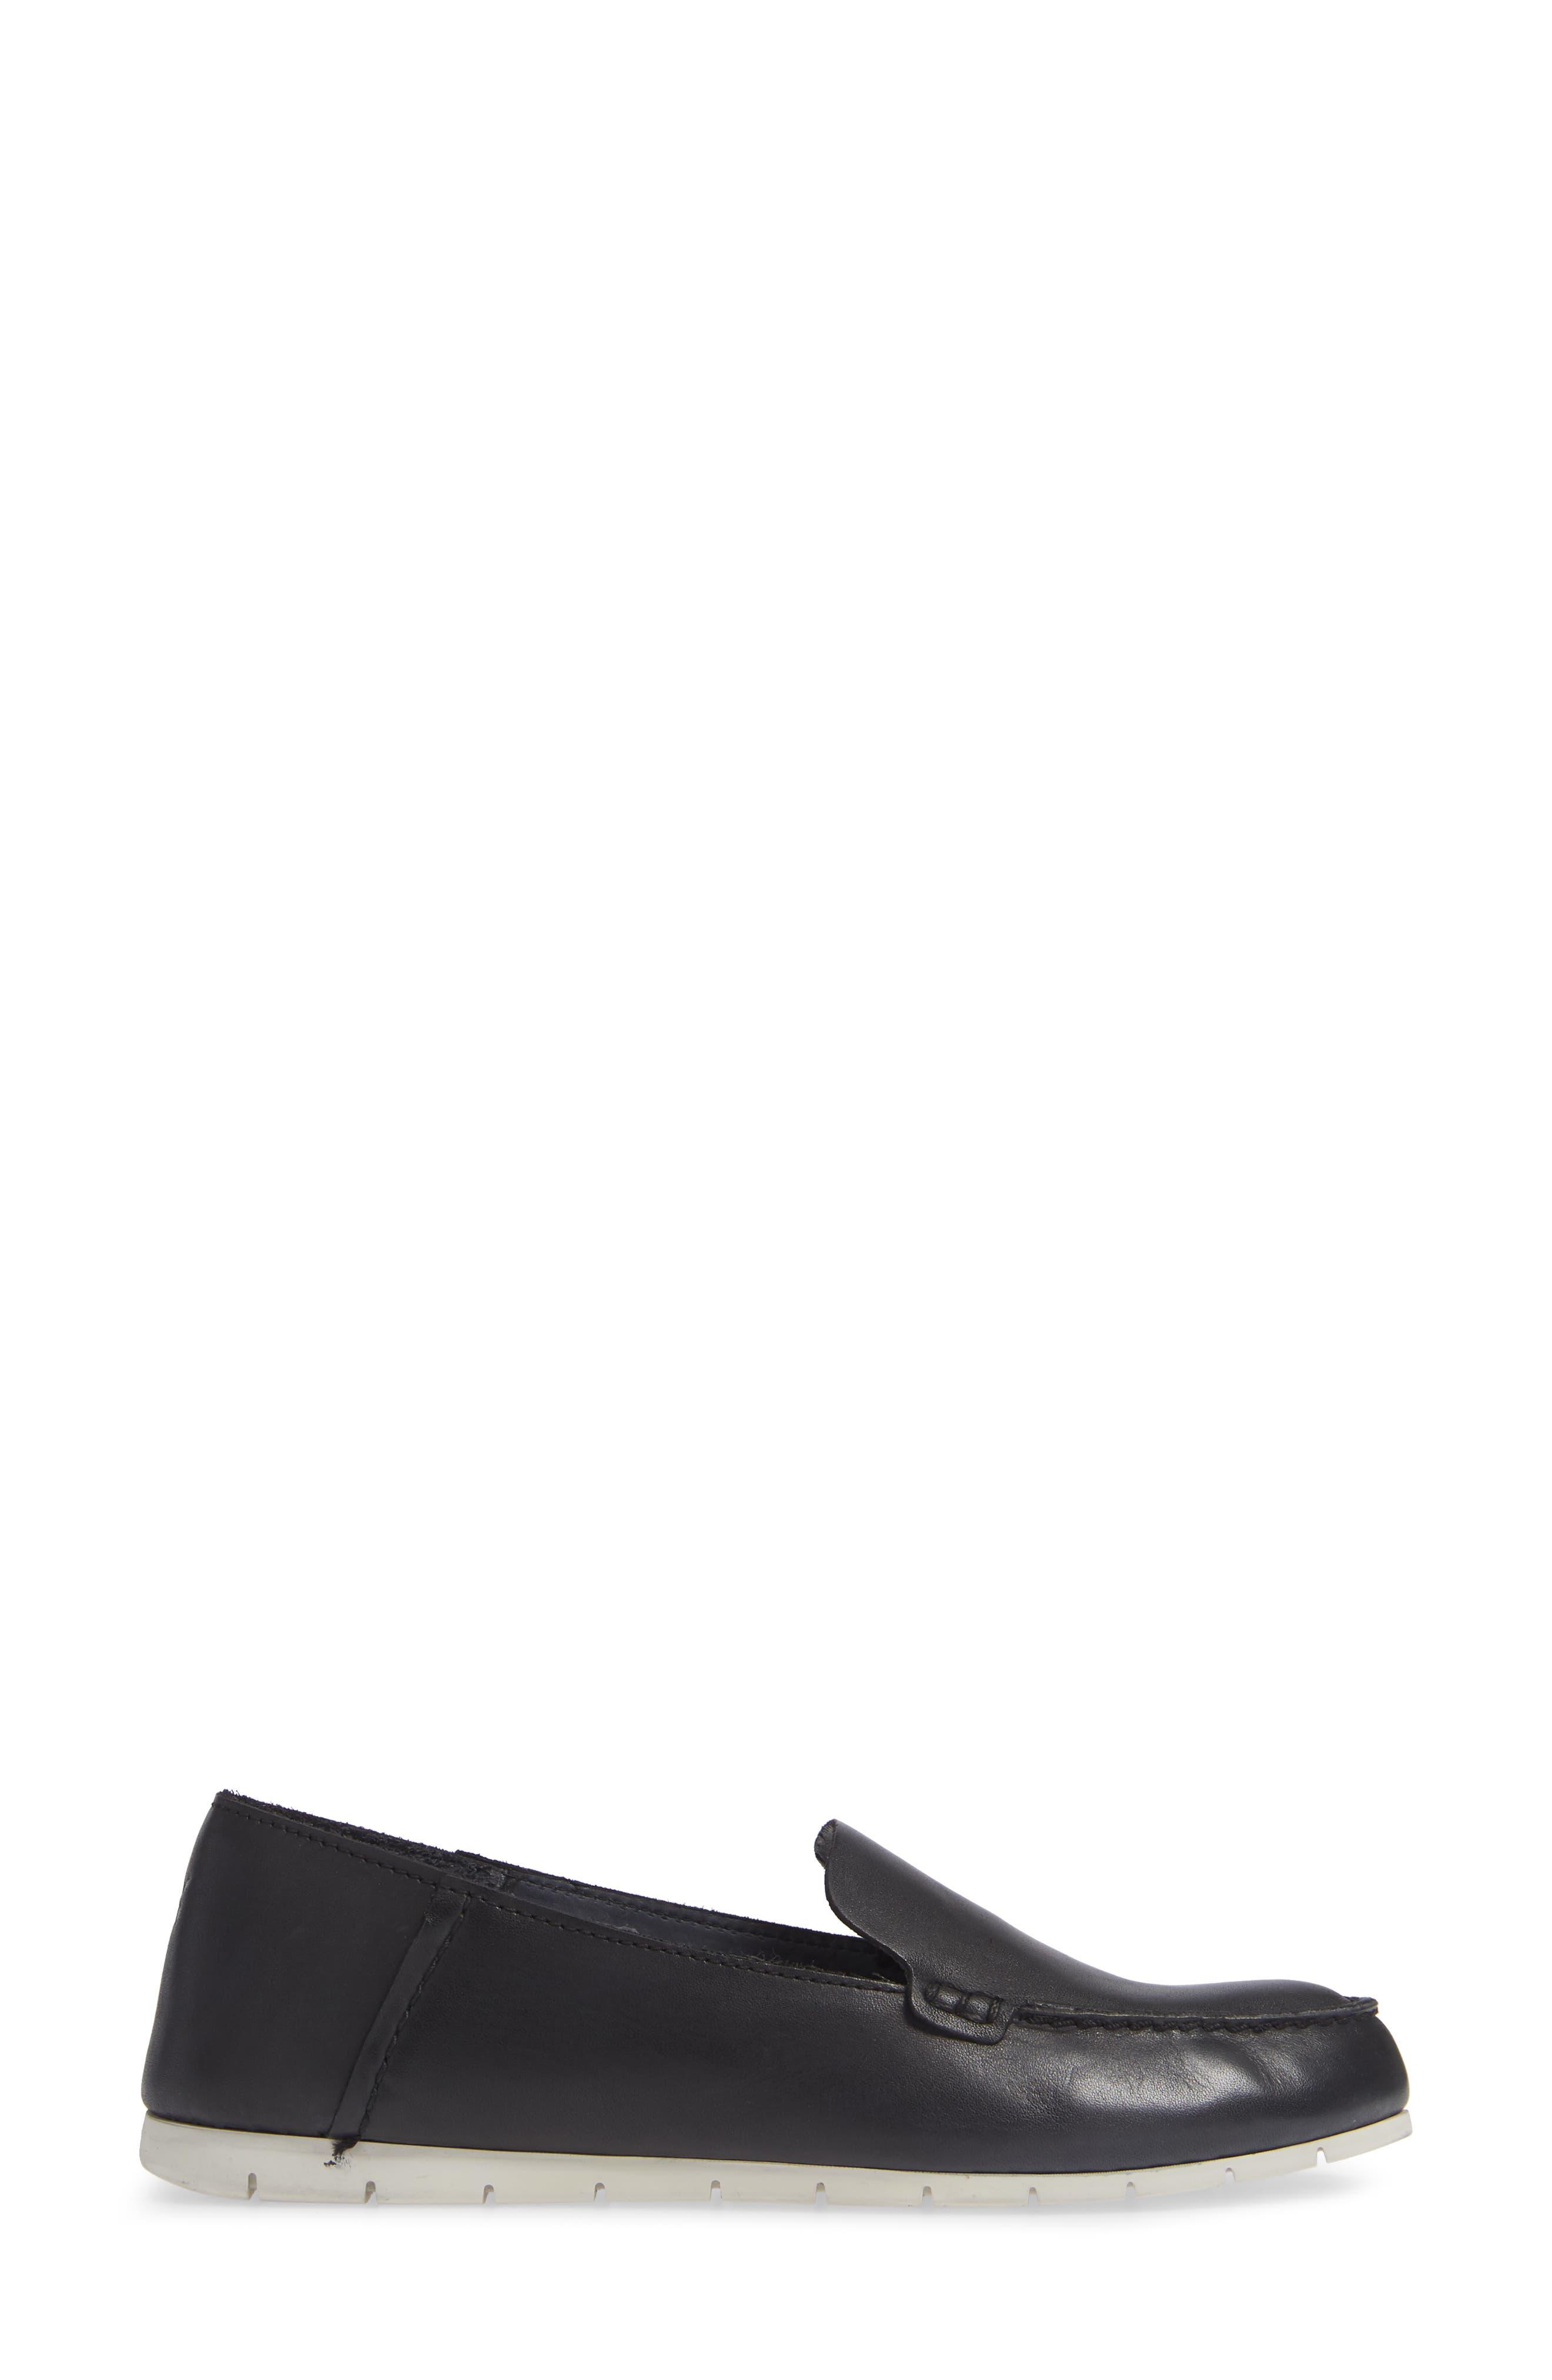 Sedona Venetian Loafer,                             Alternate thumbnail 3, color,                             BLACK LEATHER